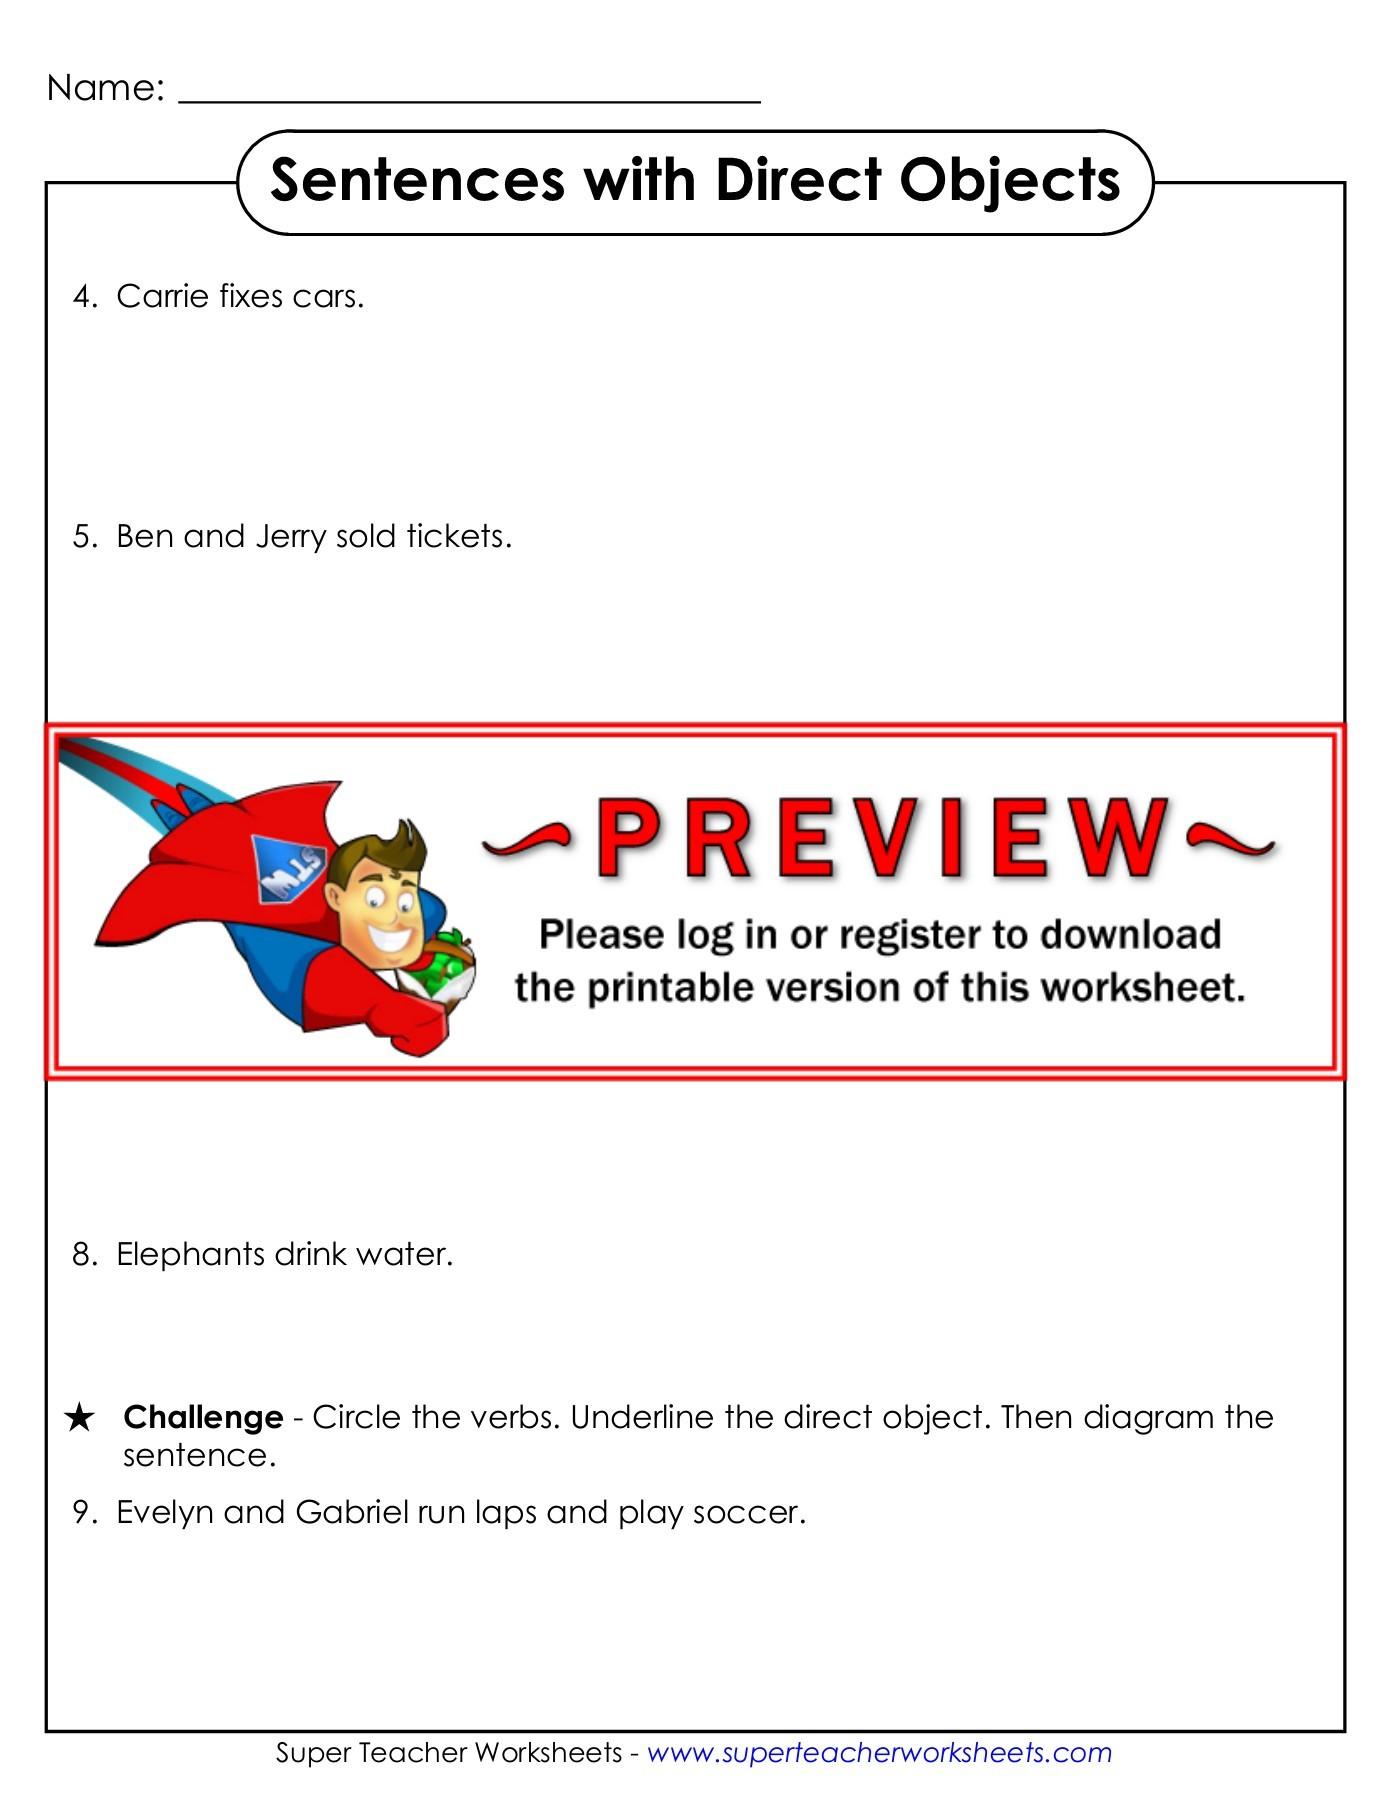 Printables Of Super Teacher Worksheeets